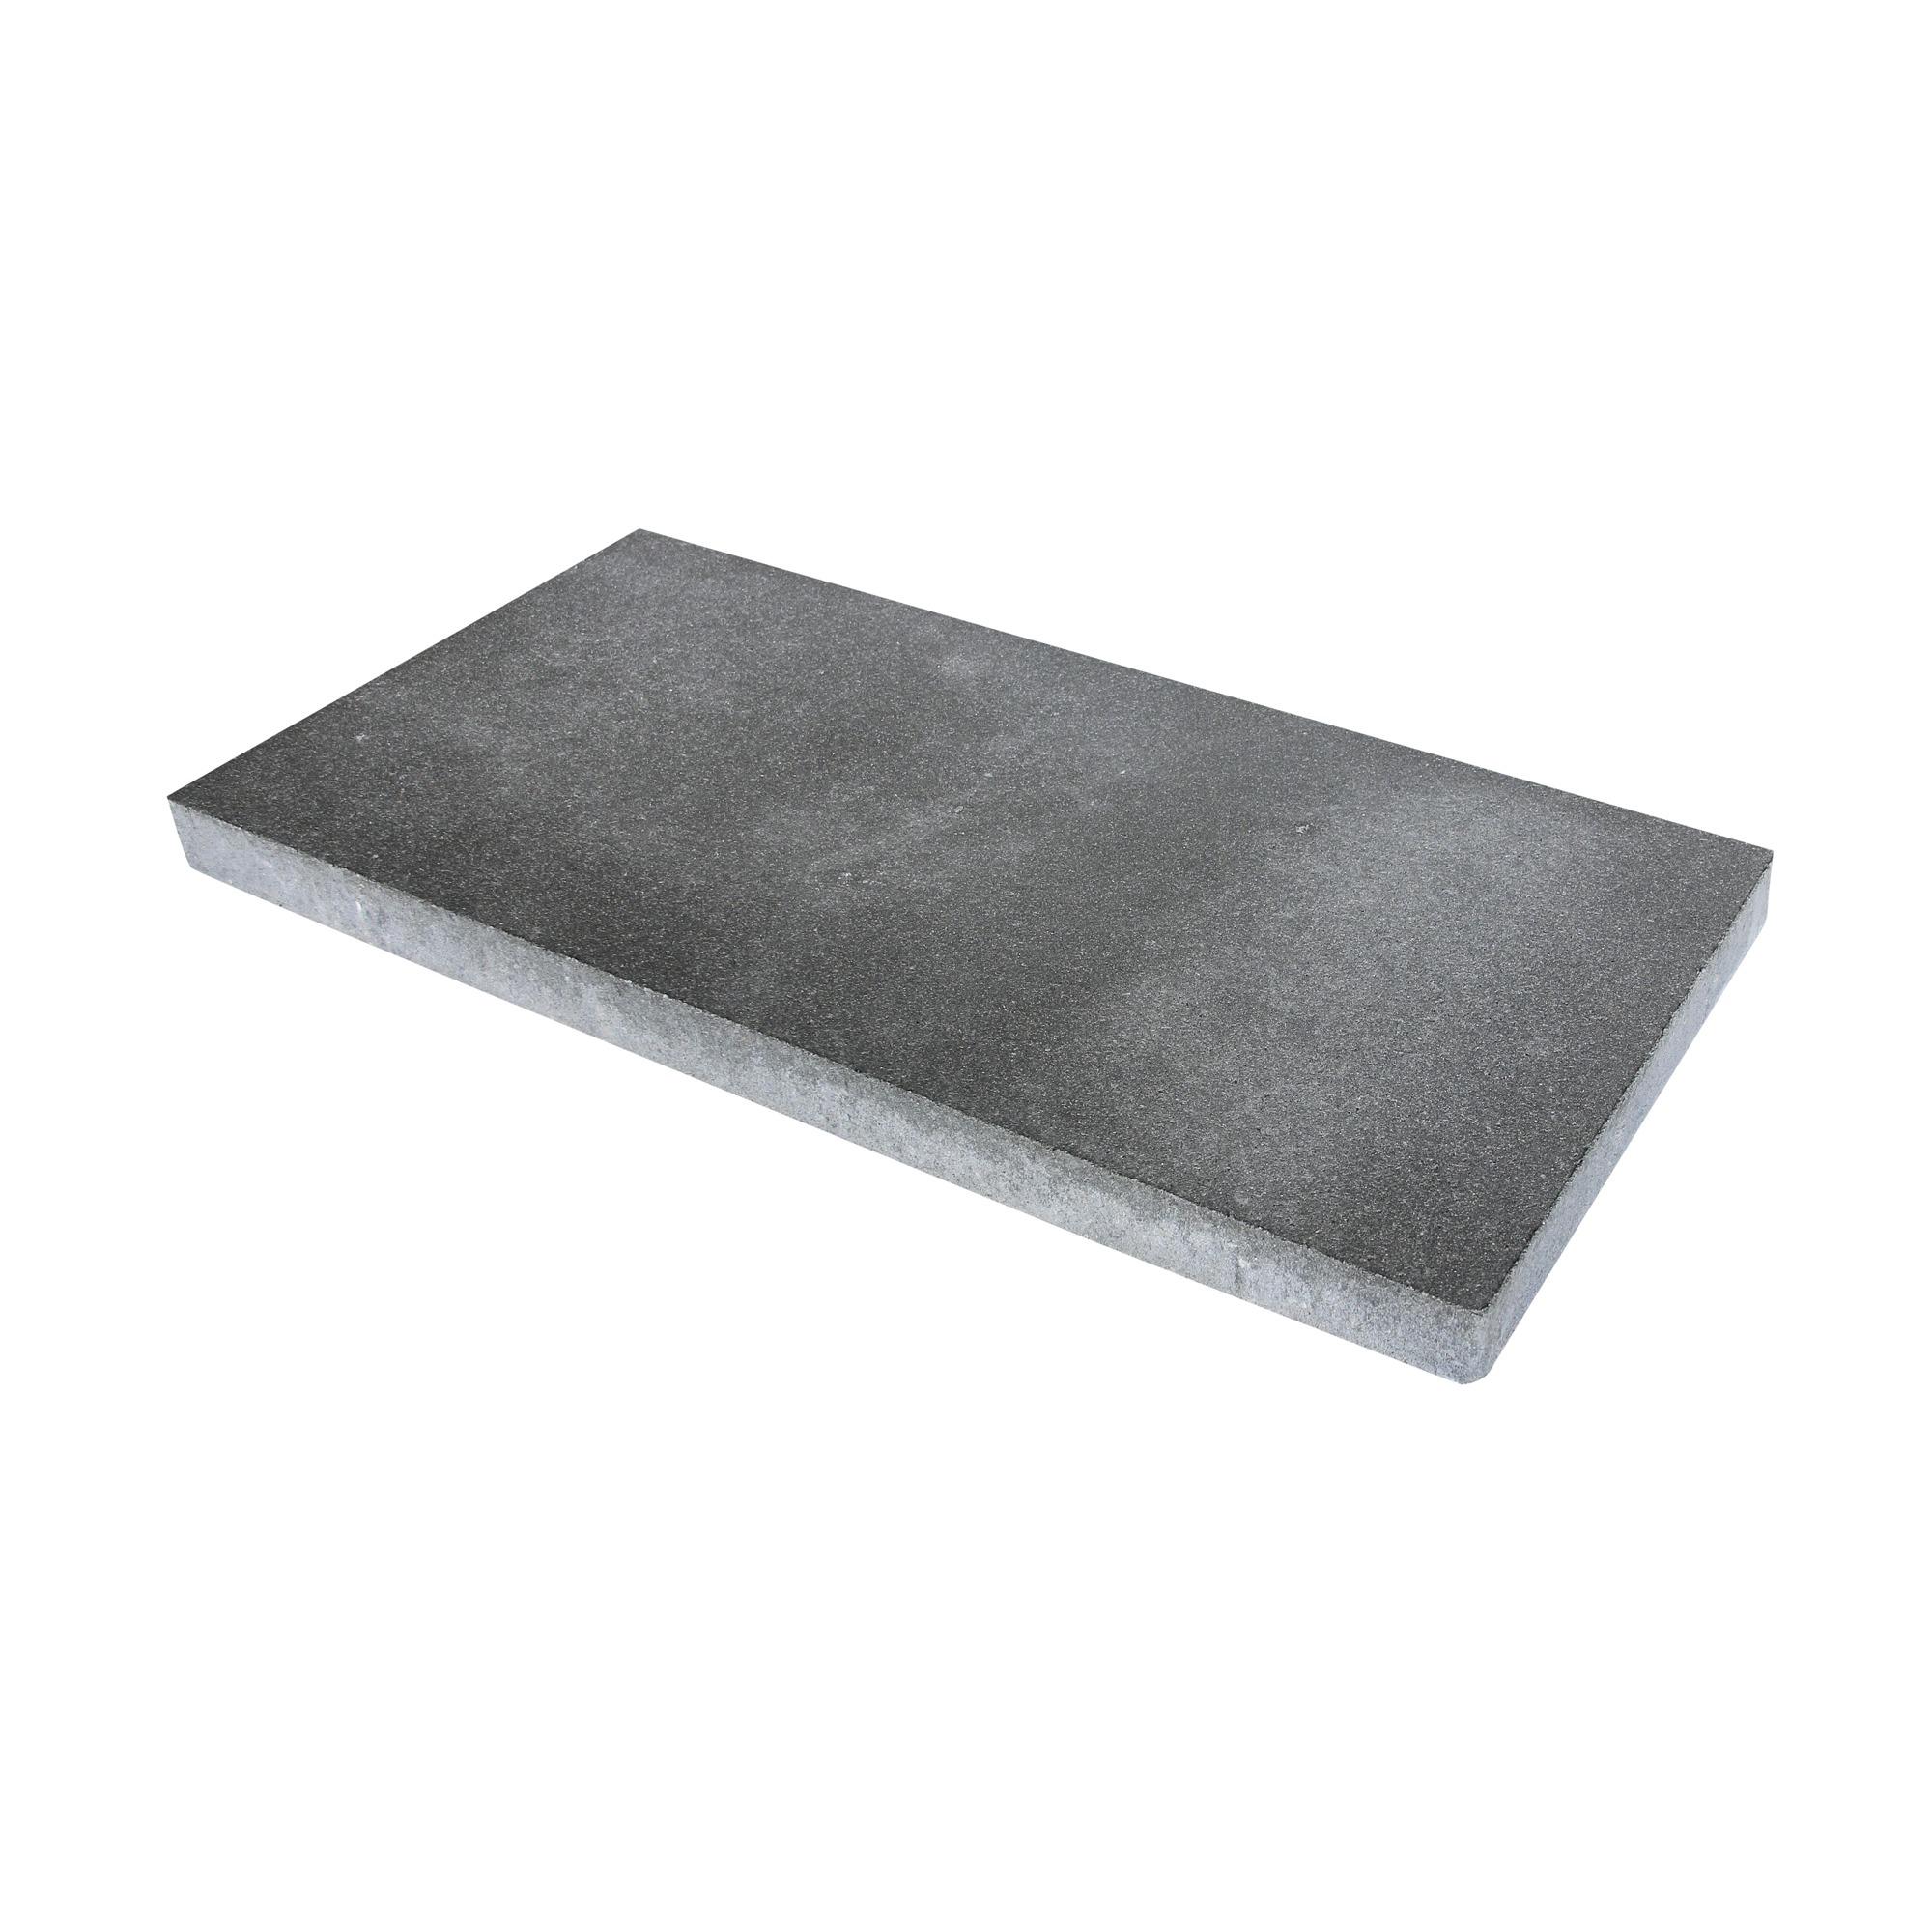 Terrastegel Beton Vegas Zwart Nuance 60x30 cm Per Tegel-0,18 m2